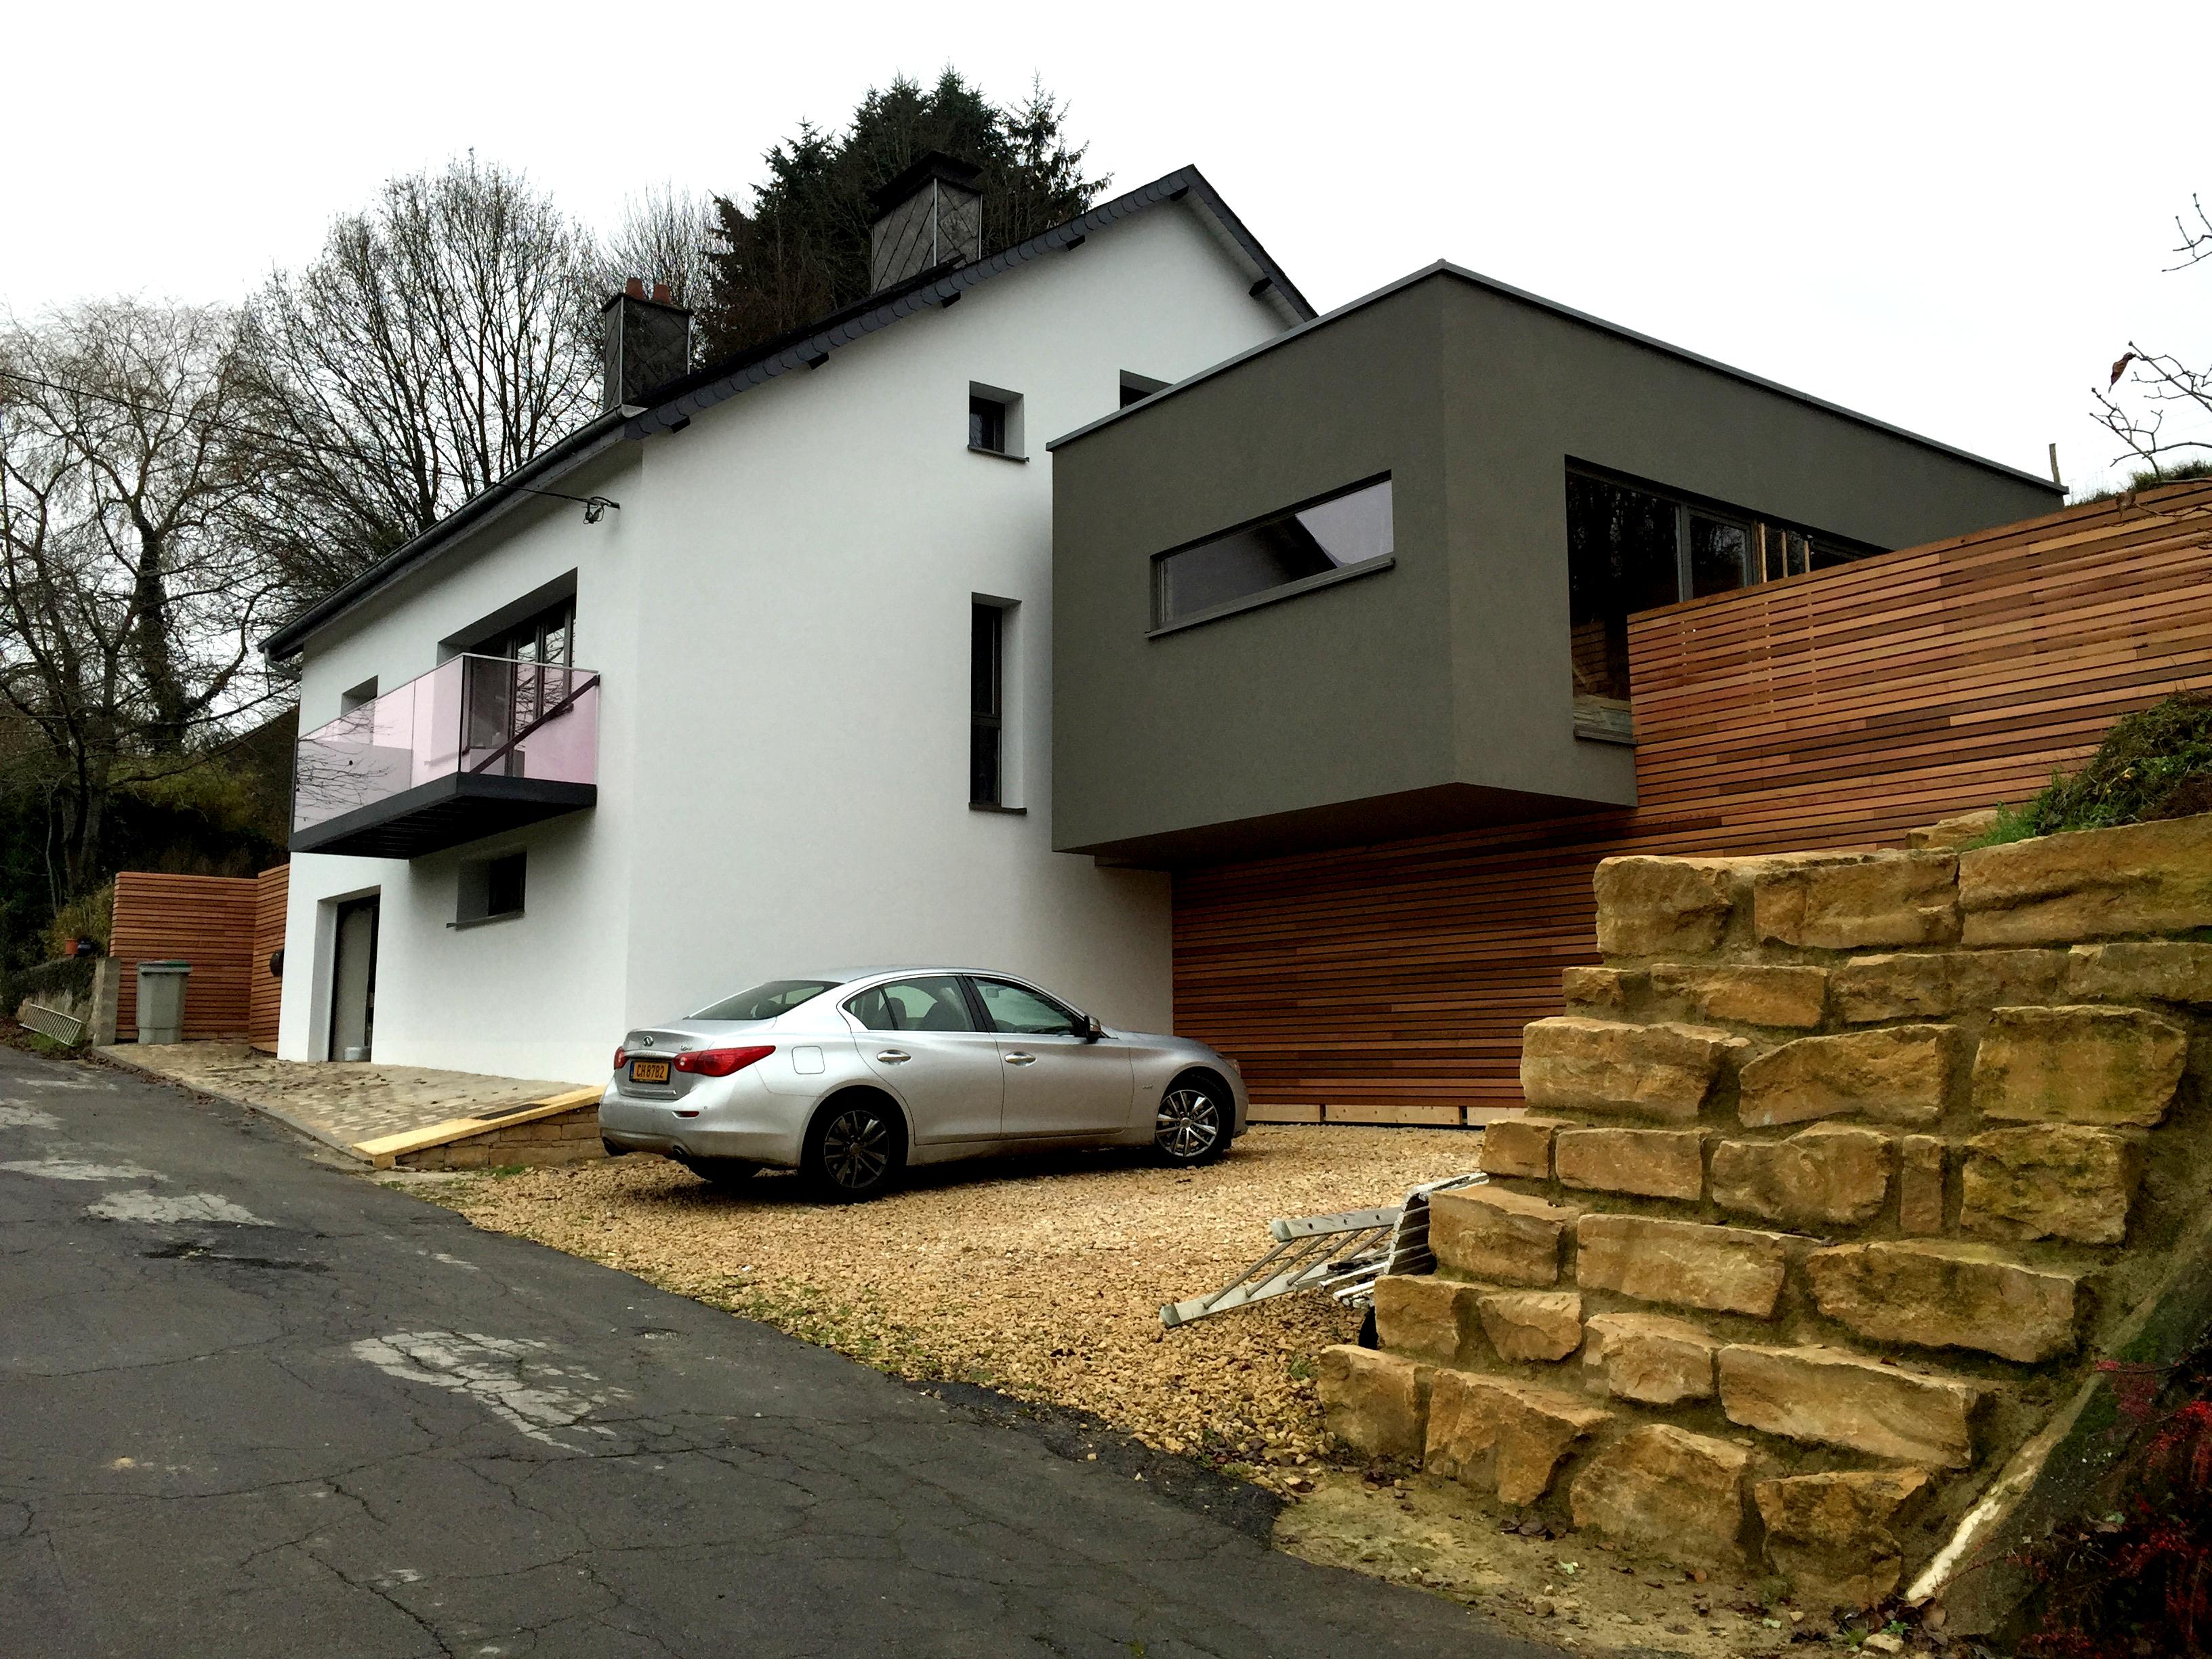 villers devant orval transformation maison altema architecture. Black Bedroom Furniture Sets. Home Design Ideas